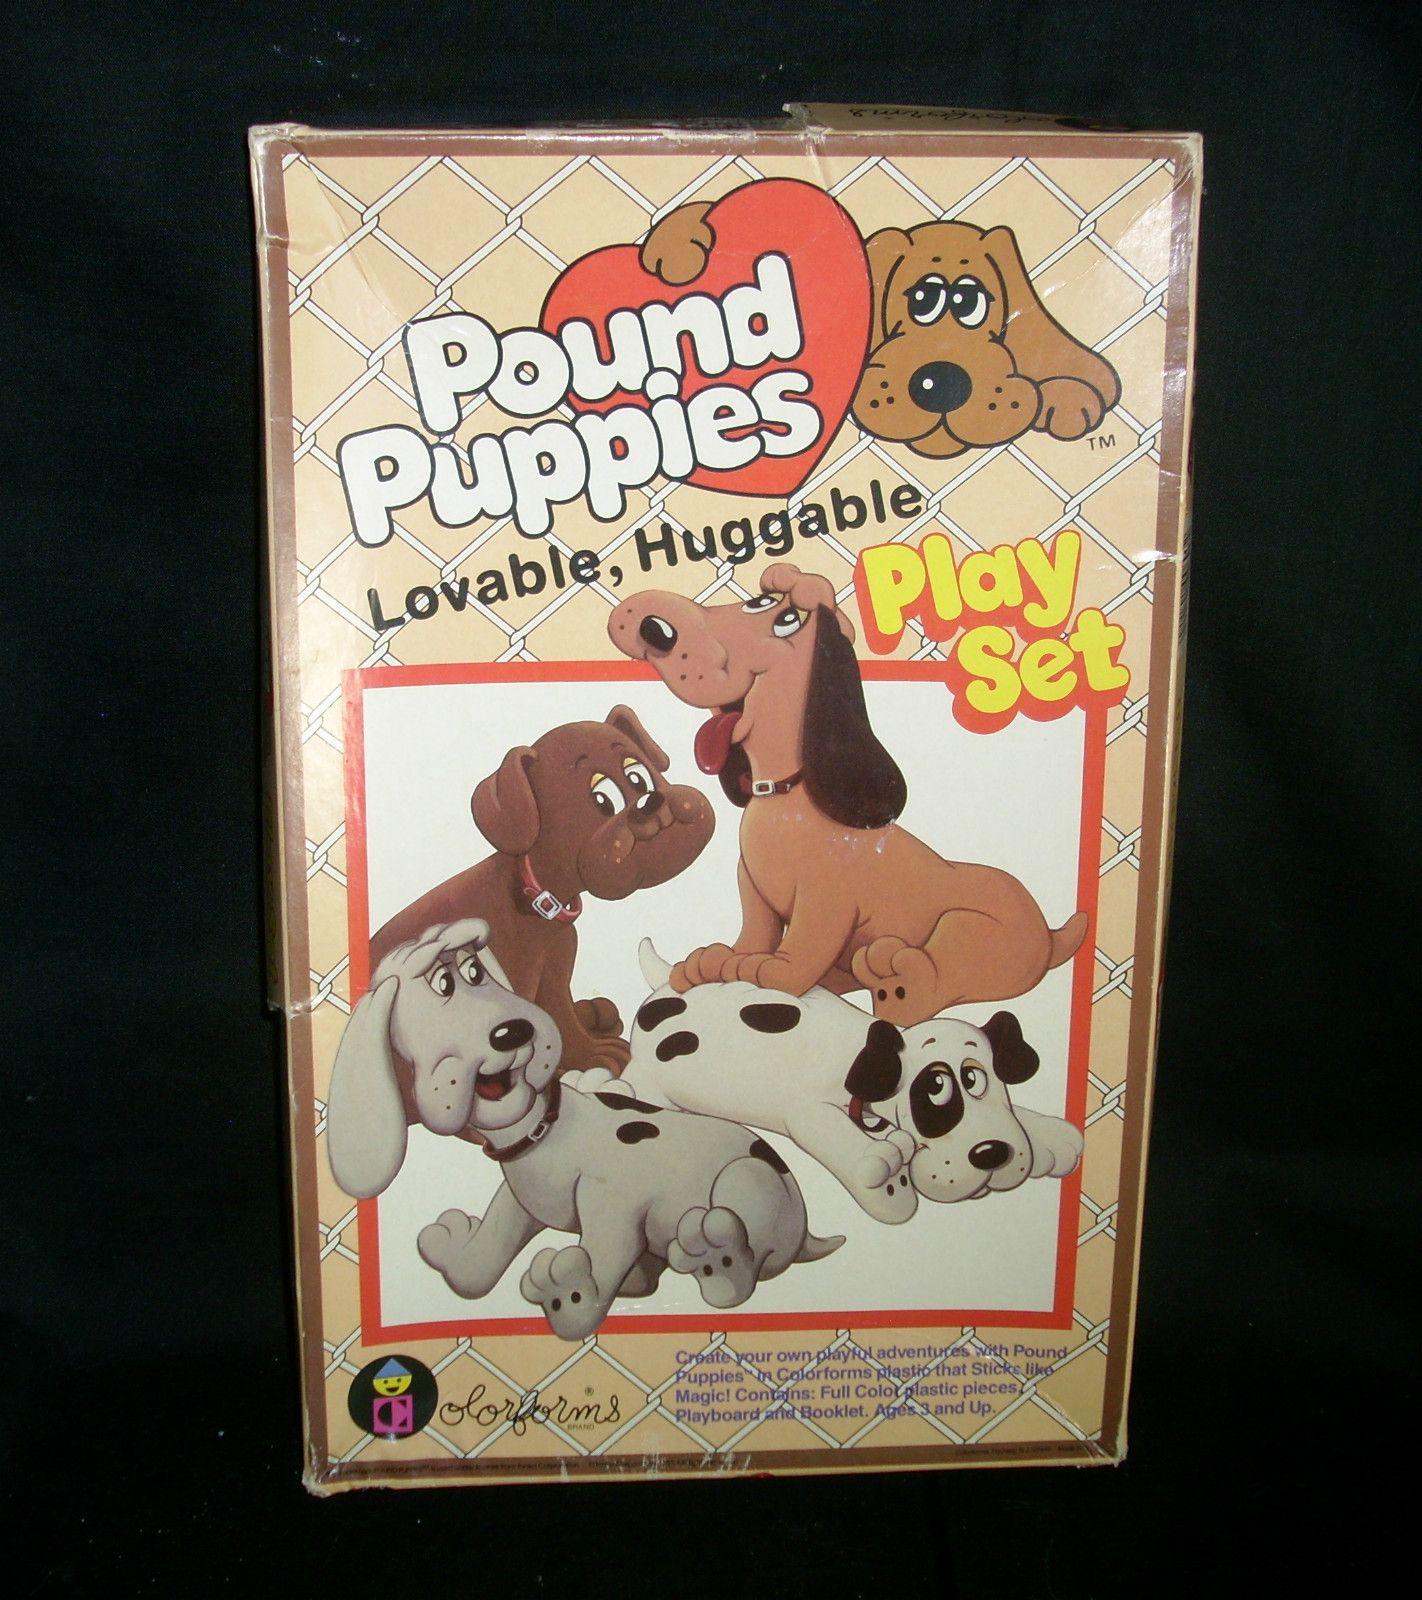 VINTAGE 1980s POUND PUPPIES PUPPY COLORFORMS PLAY SET ORIGINAL BOX